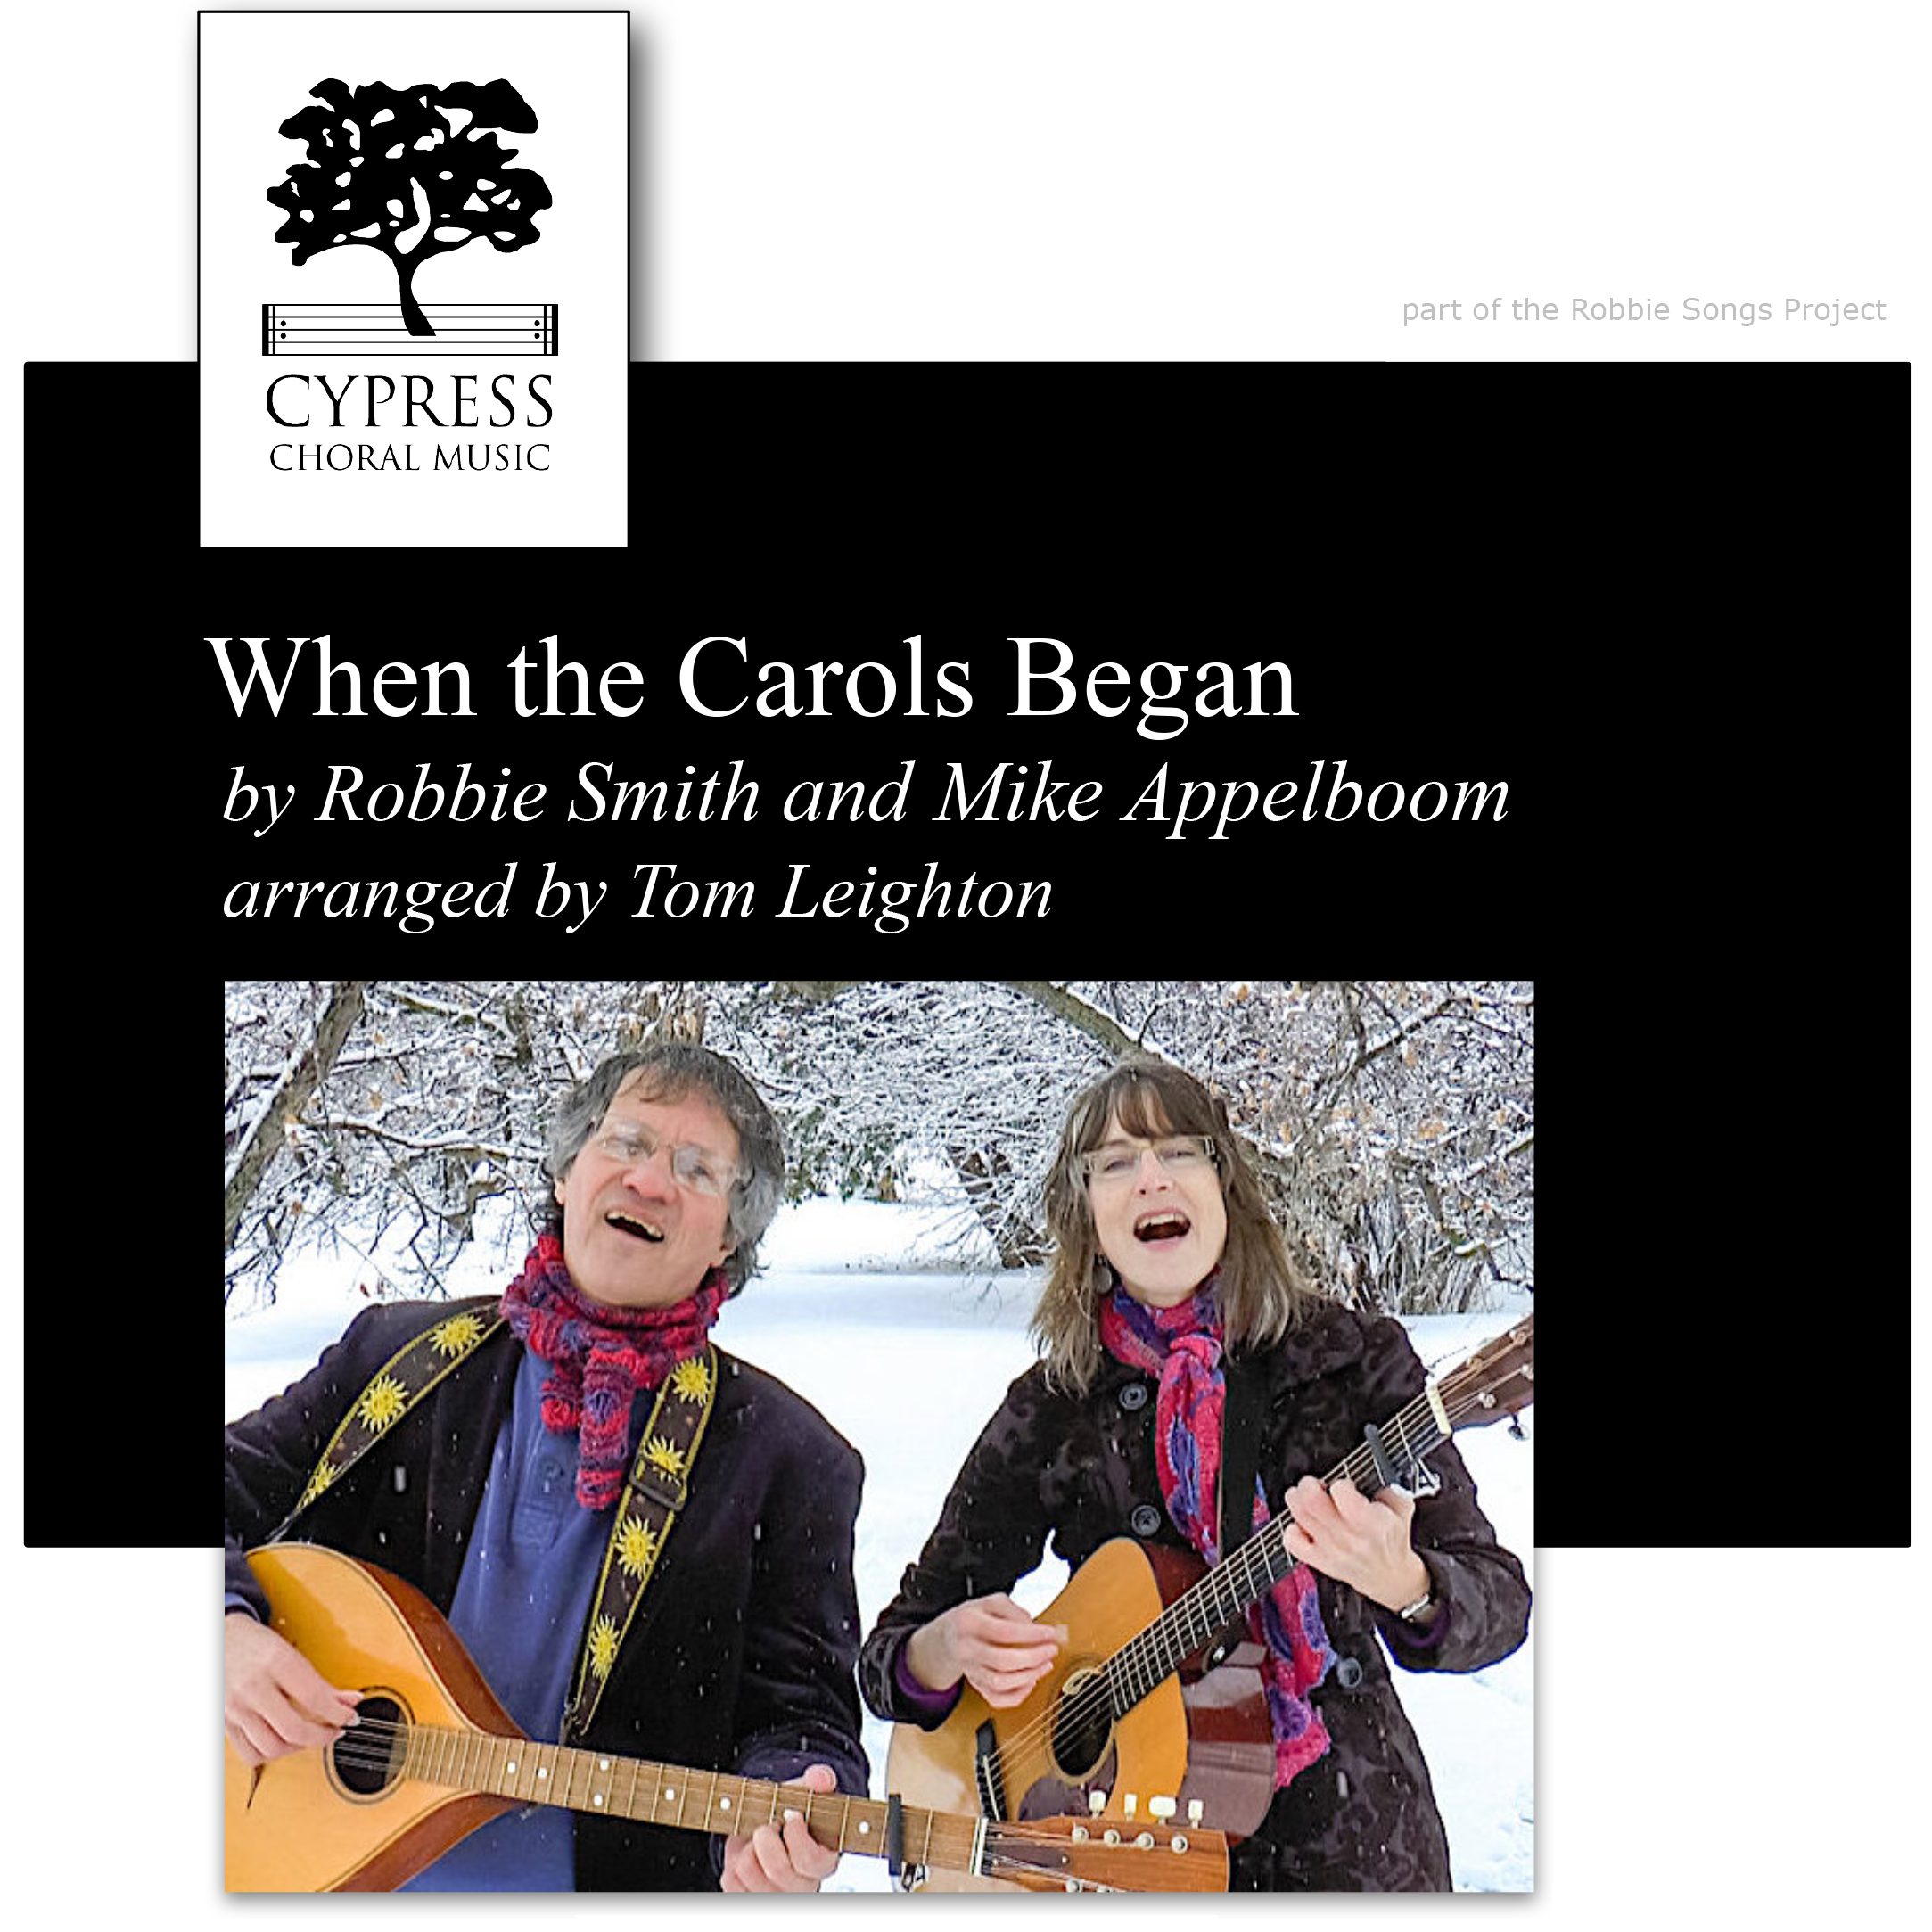 CP 1943-When the Carols Began-thumb